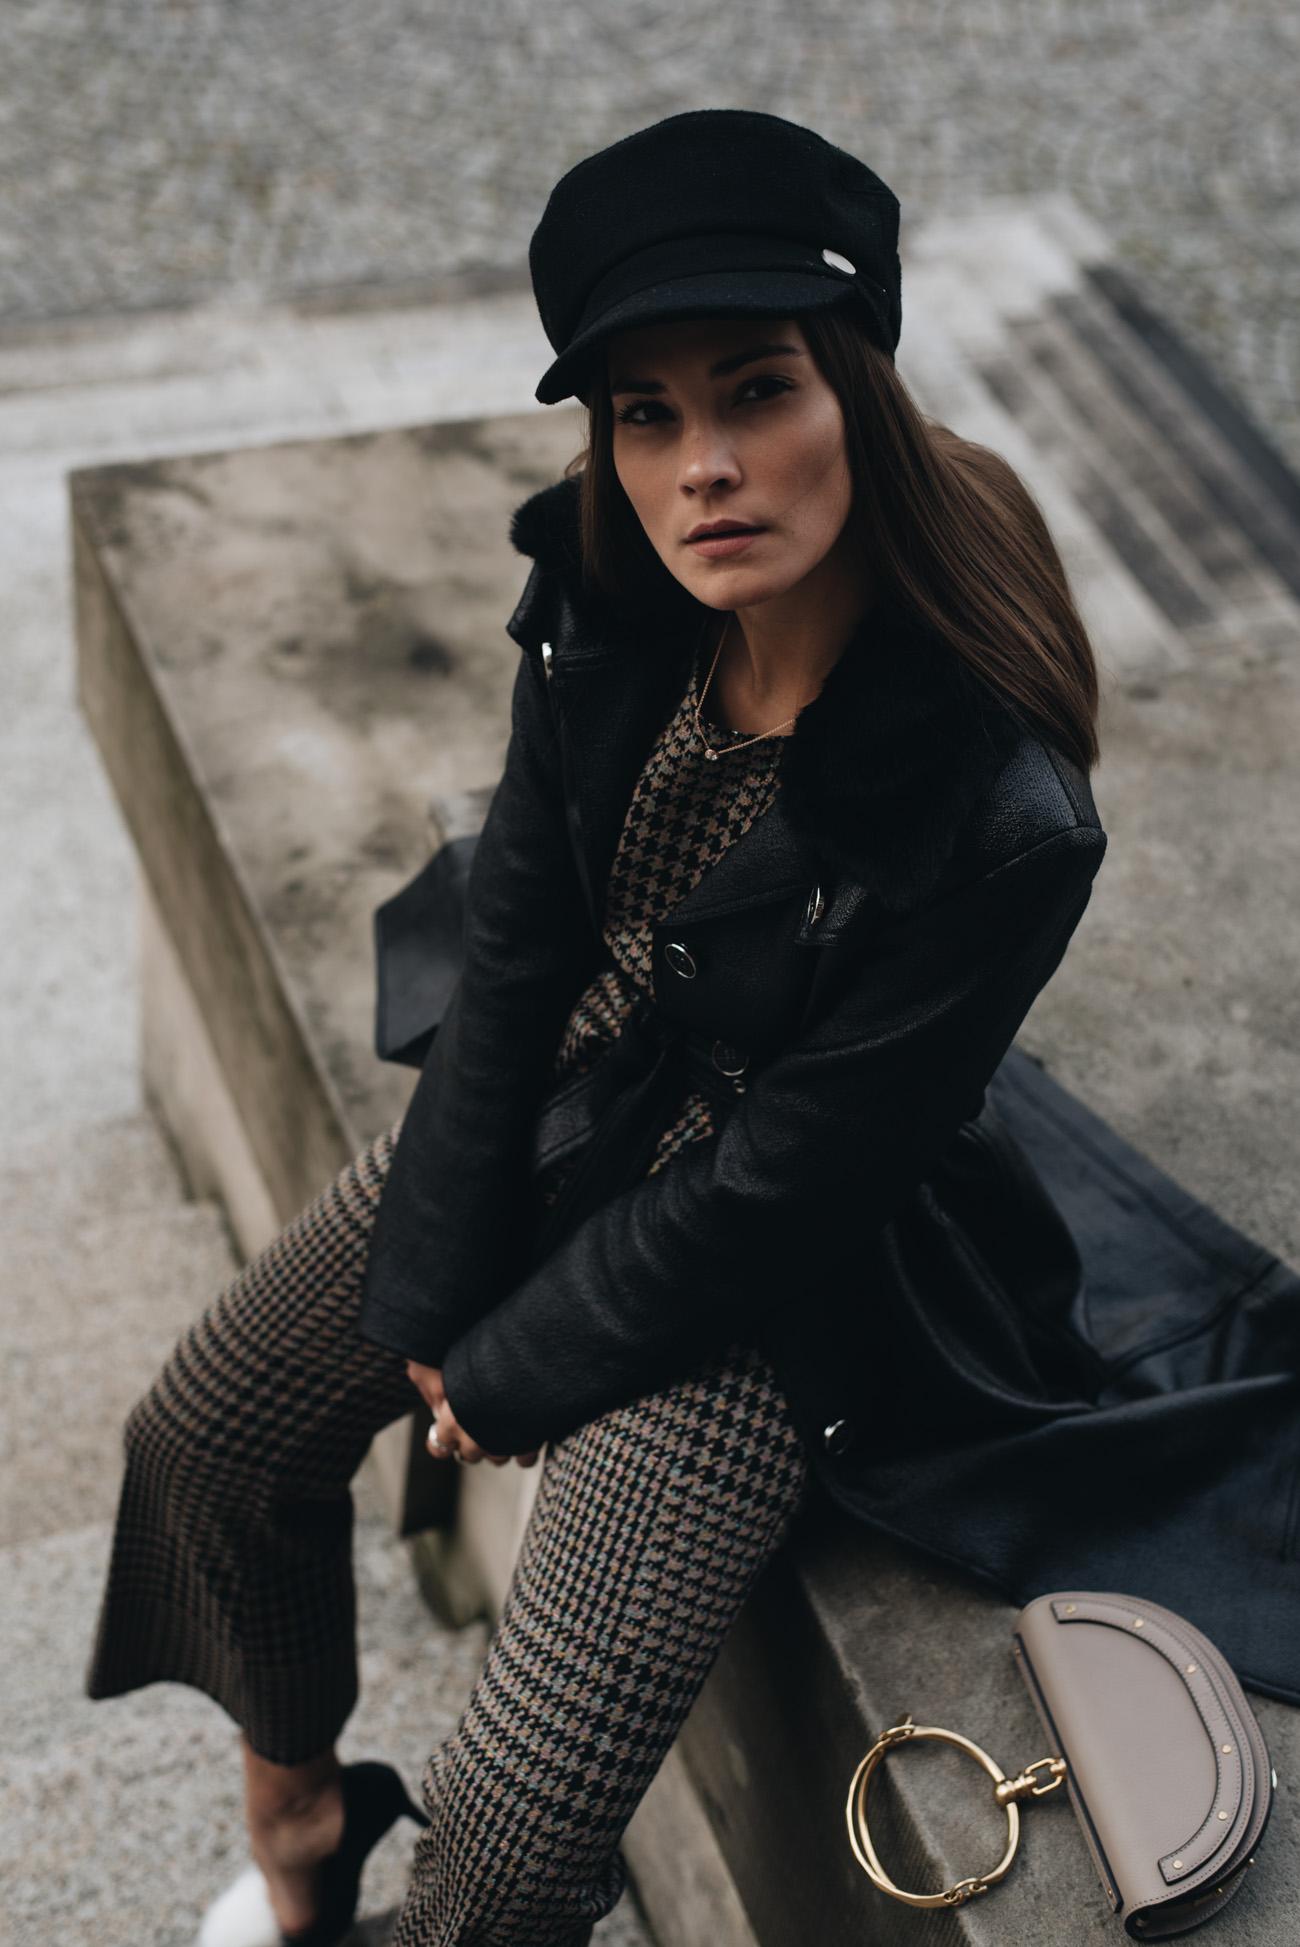 mode-bloggerin-nina-schwichtenberg-streetstyle-mode-trends-herbst-winter-2017-mäntel-fashiioncarpet